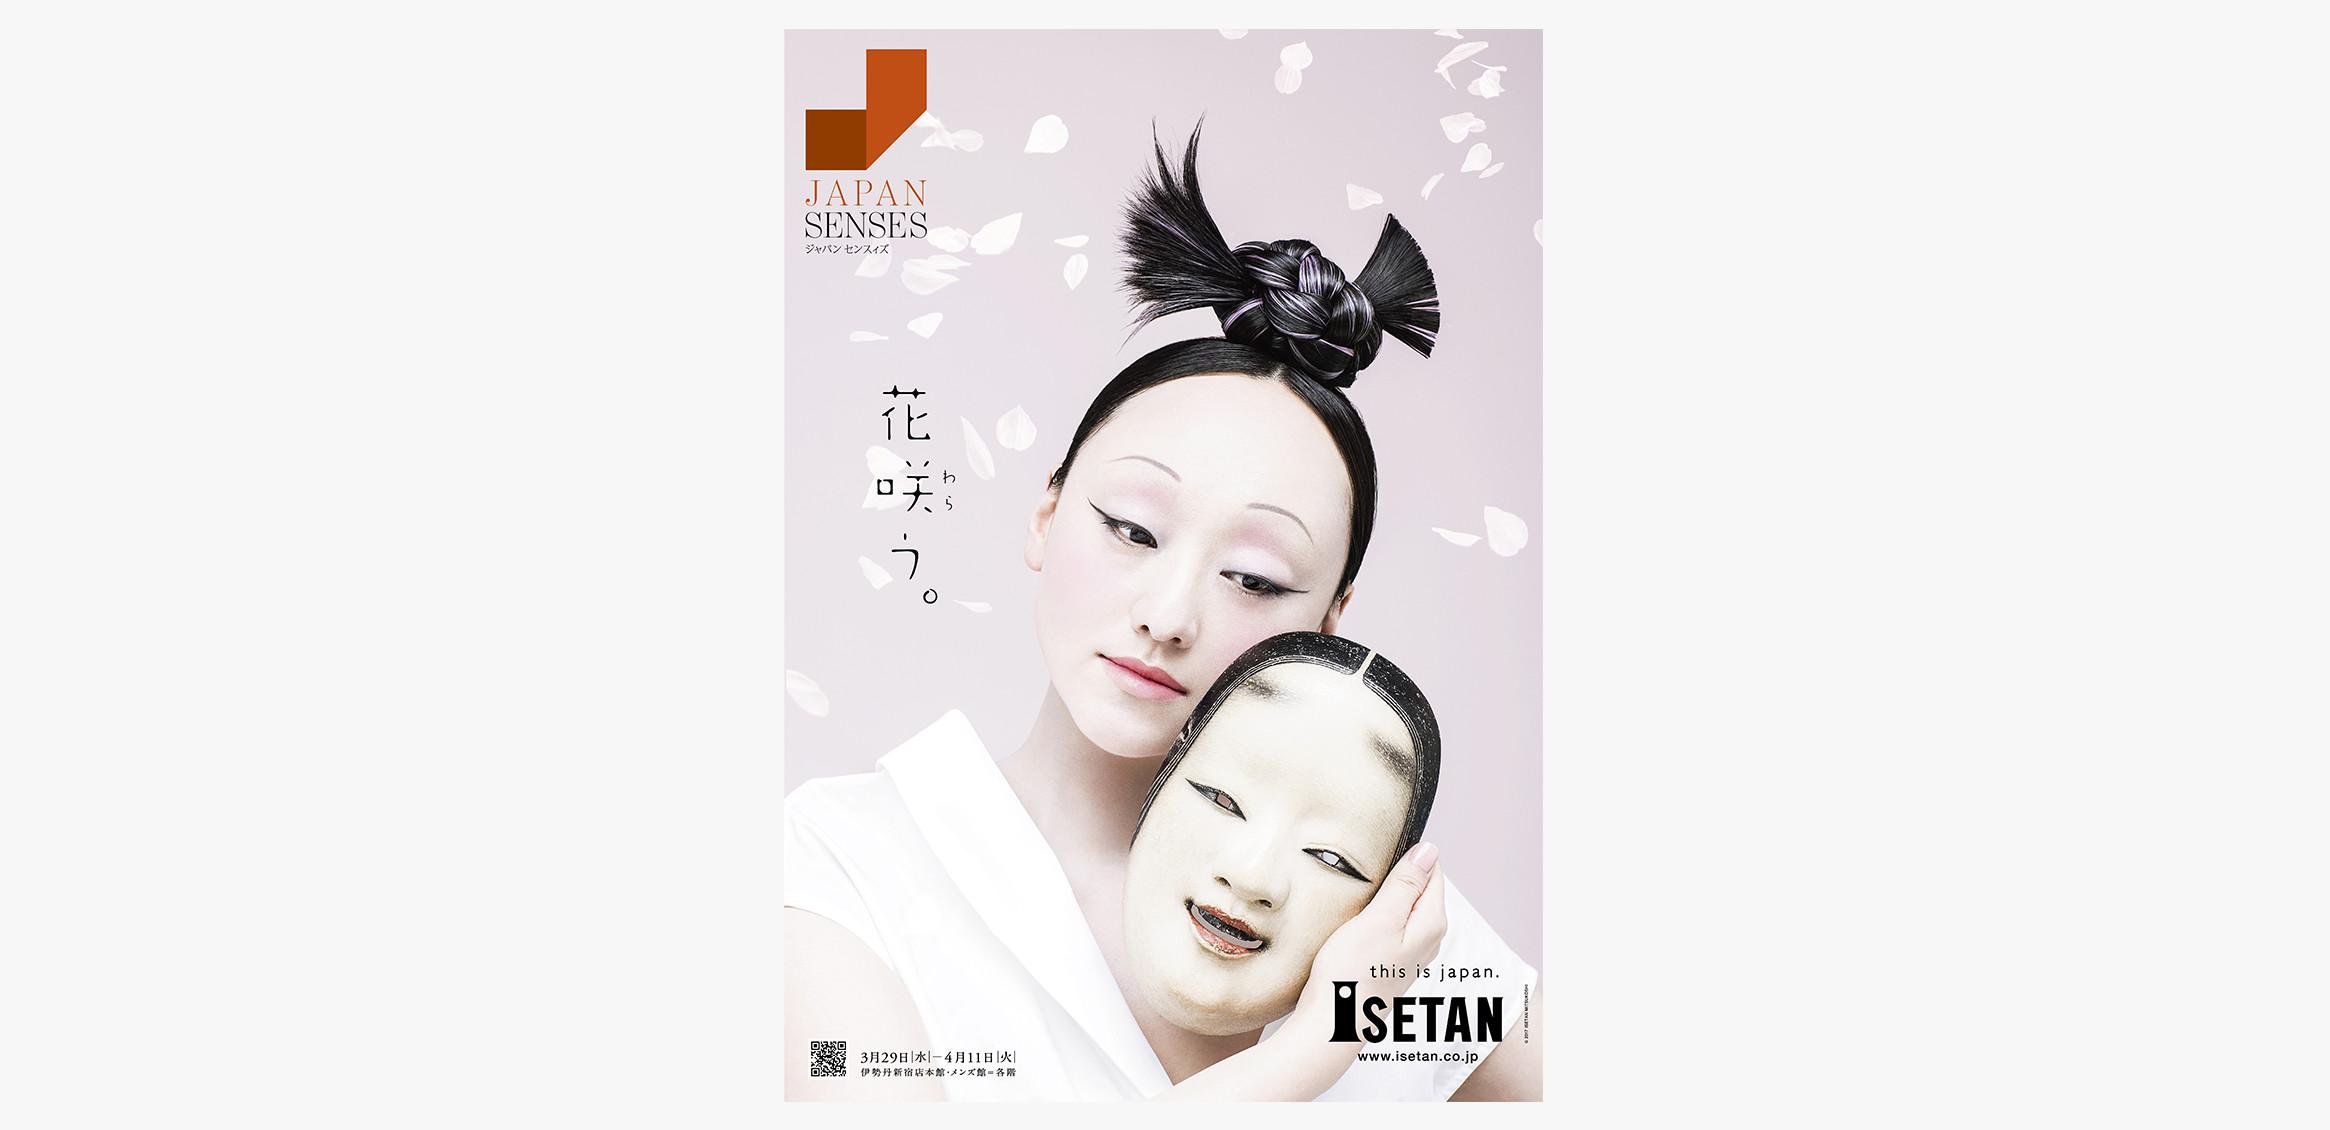 三越伊勢丹  JAPAN SENSES 2017 春1枚目